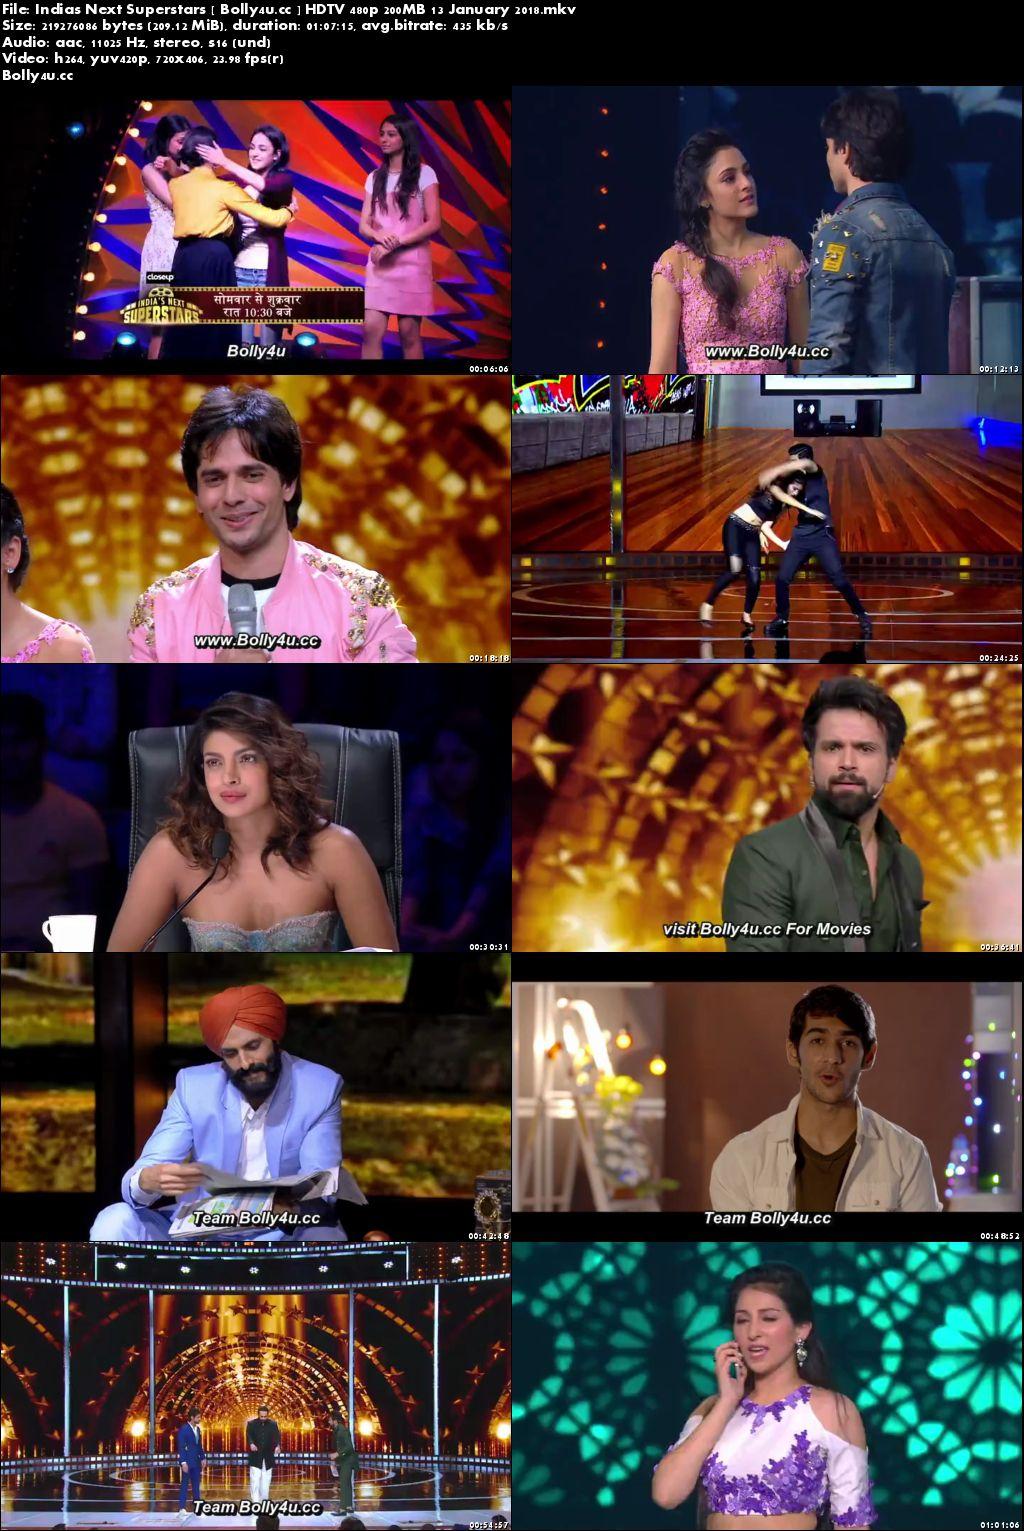 Indias Next Superstars HDTV 480p 200MB 13 January 2018 Download